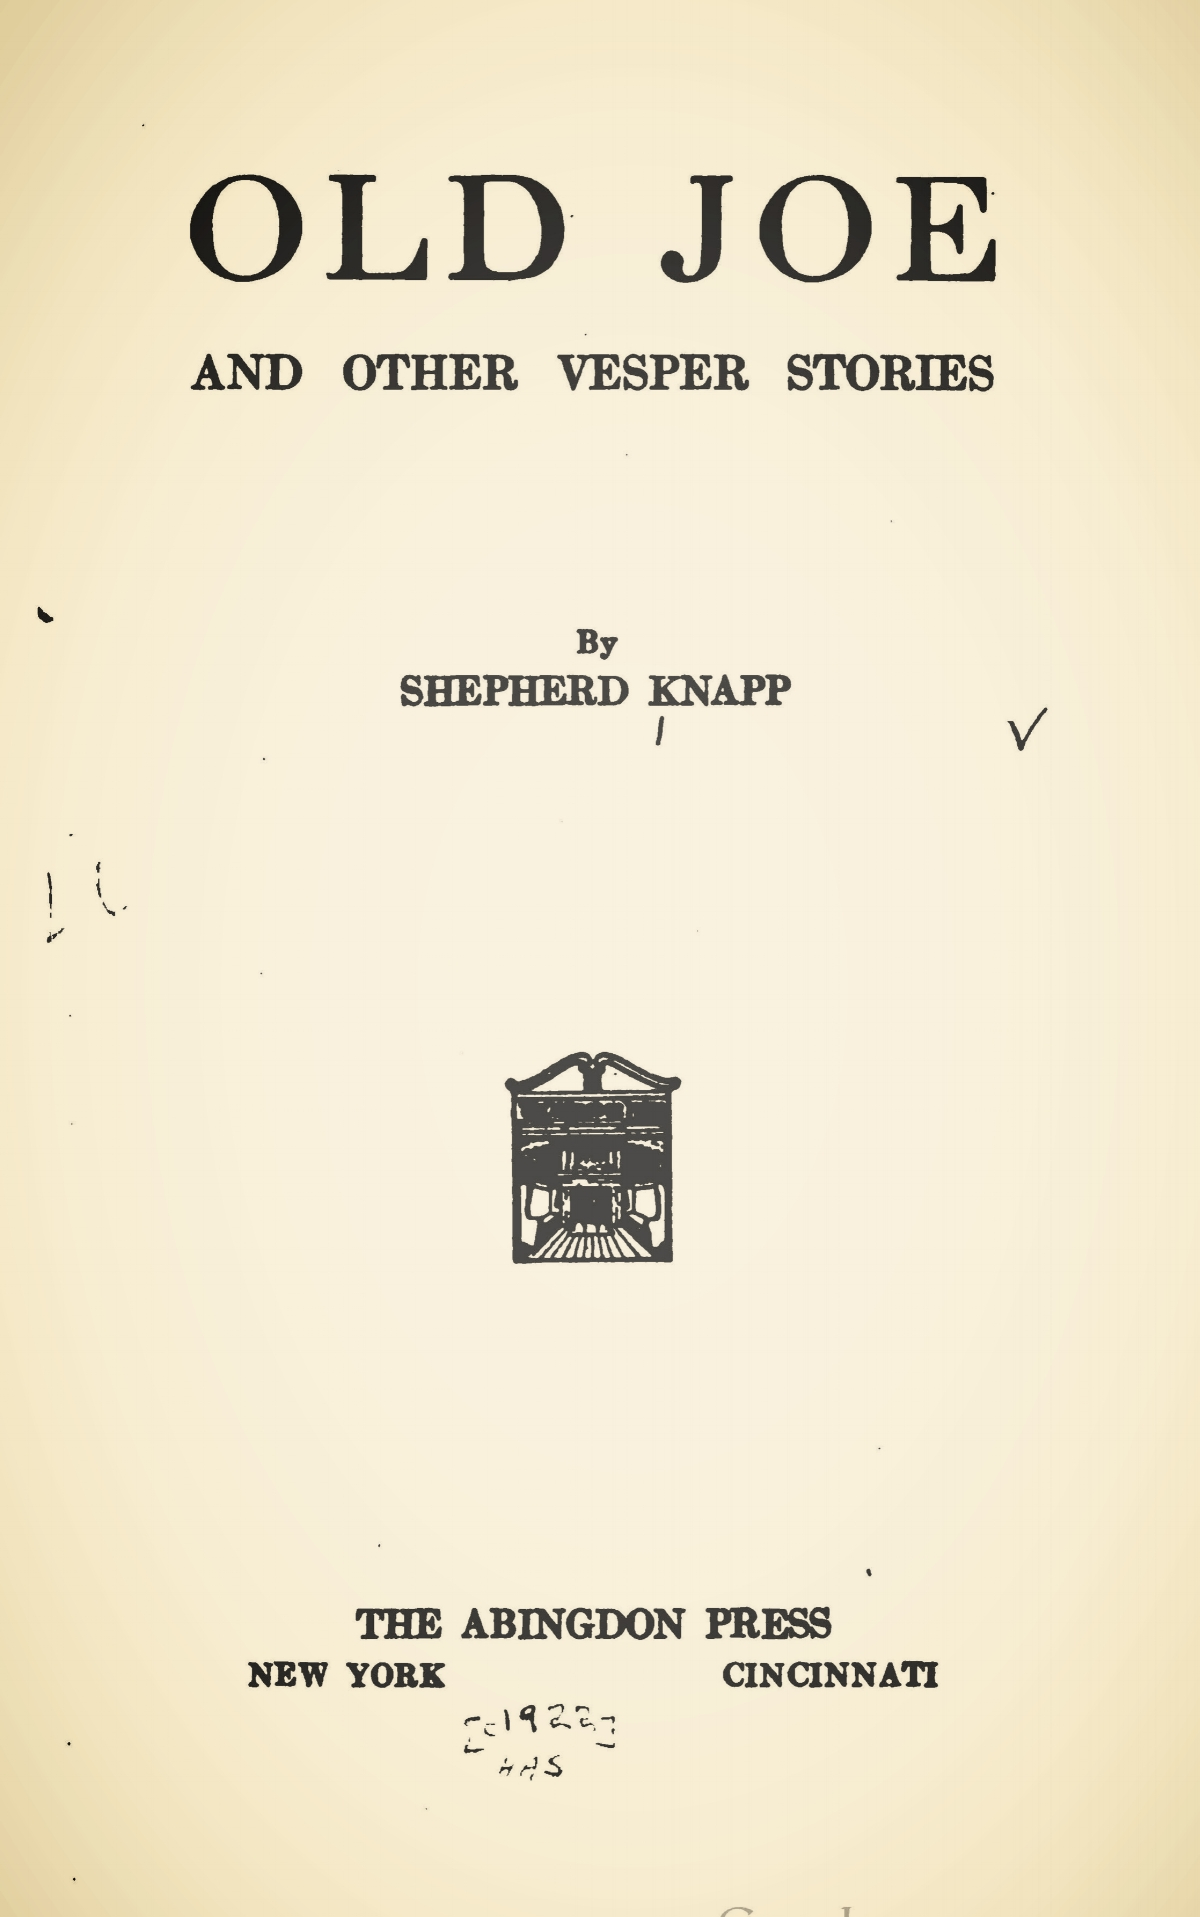 Knapp, Jr., Shepherd, Old Joe and Other Vesper Stories Title Page.jpg